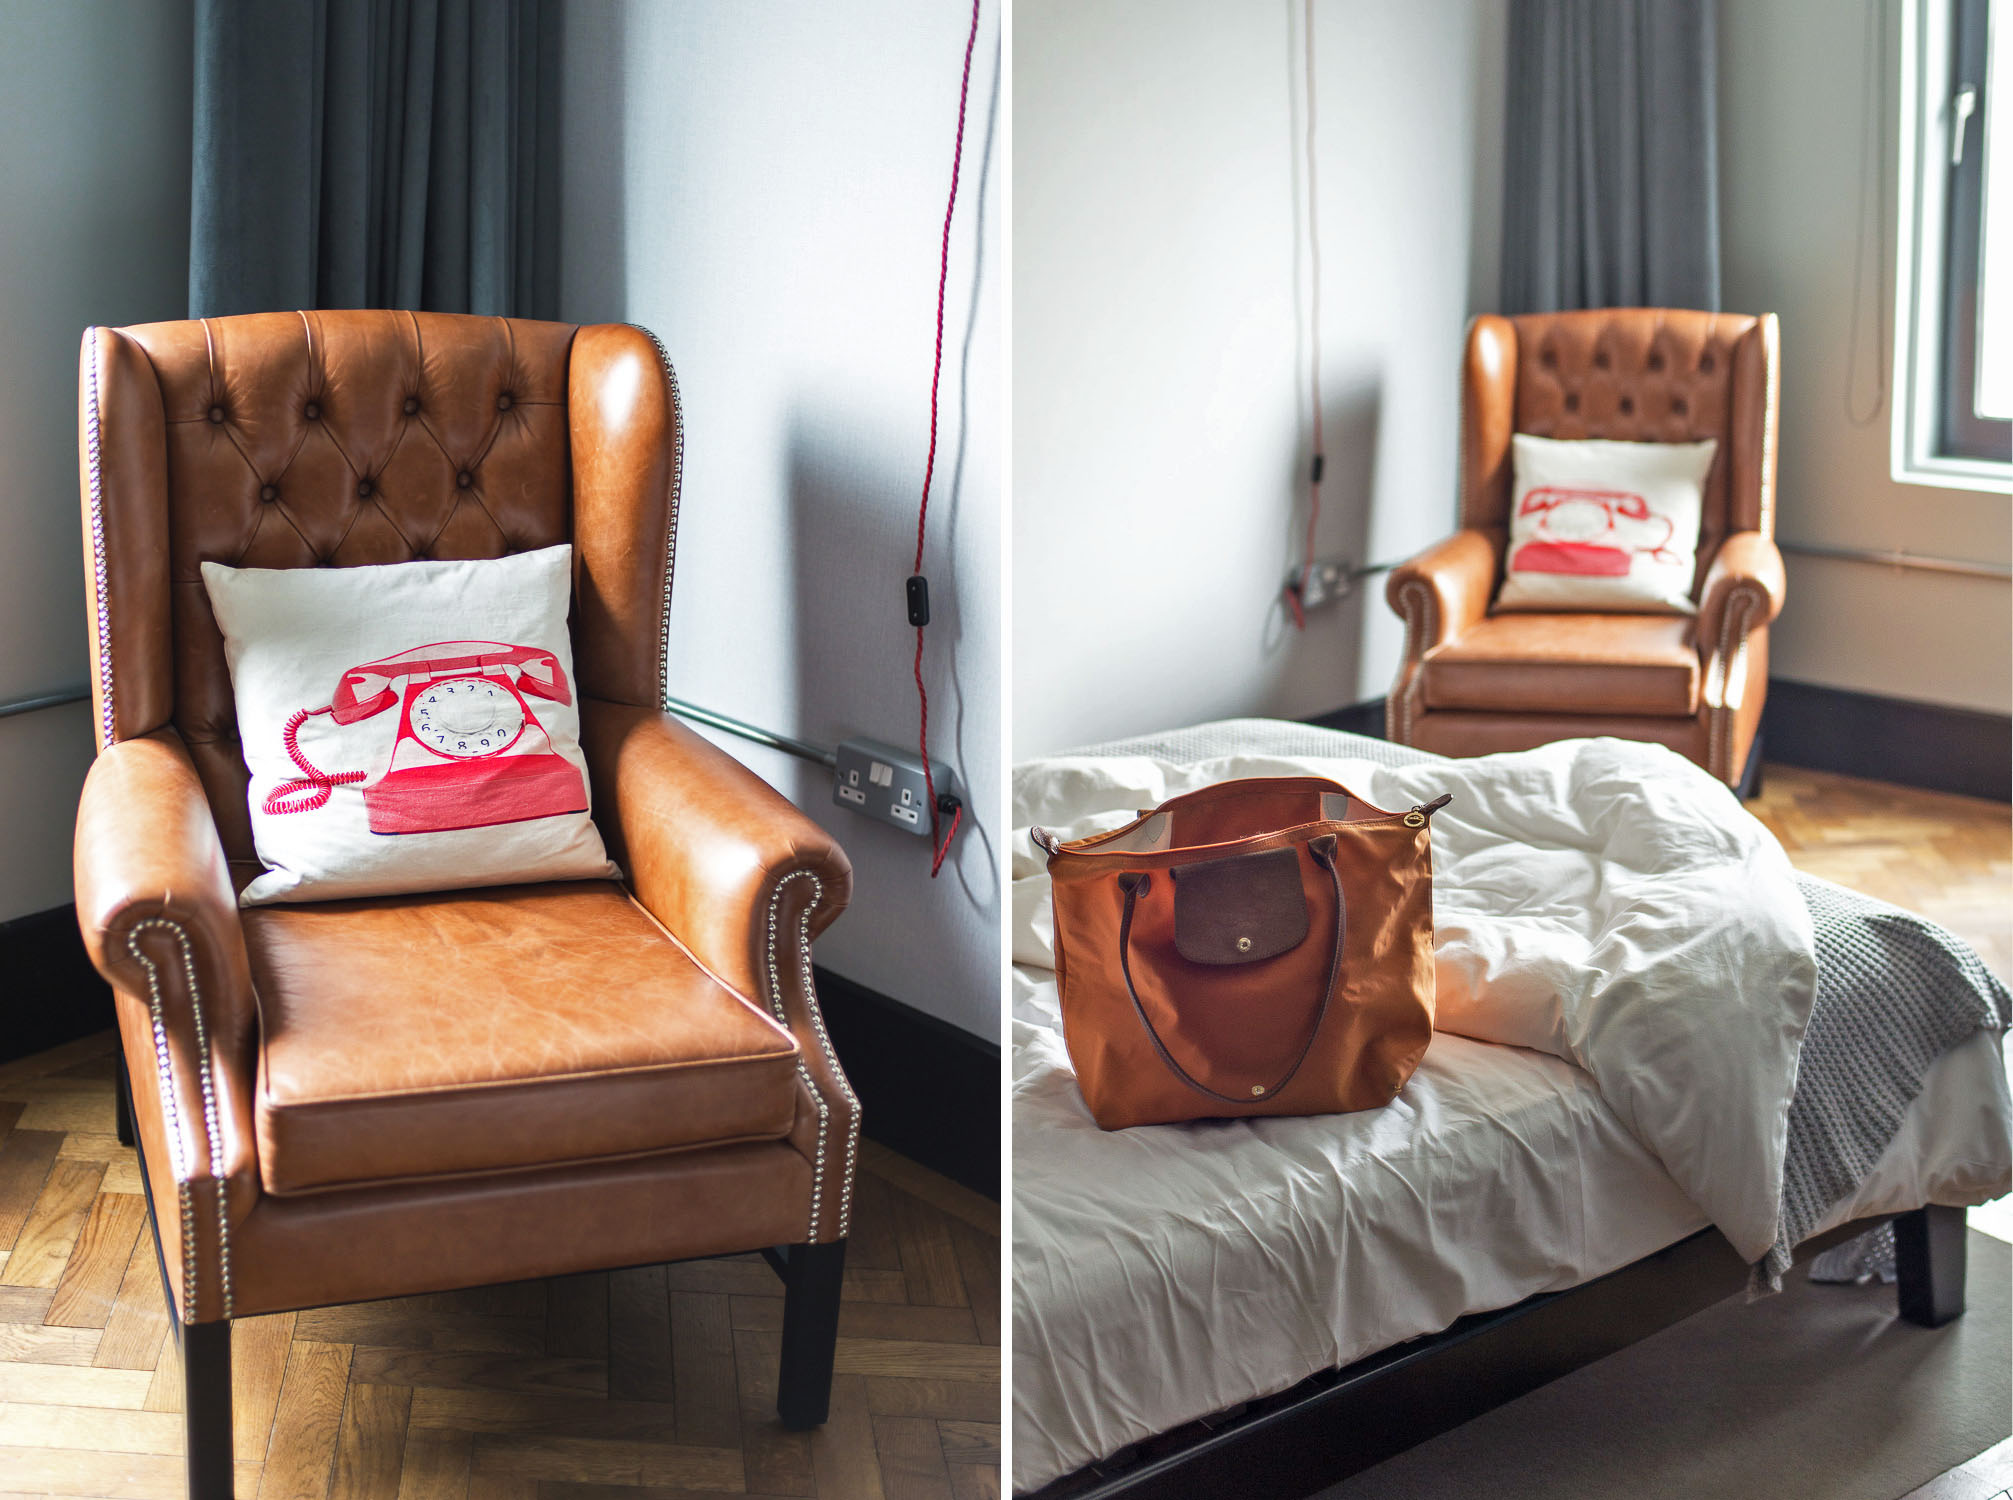 The-Hoxton-Hotel-London-9 copy